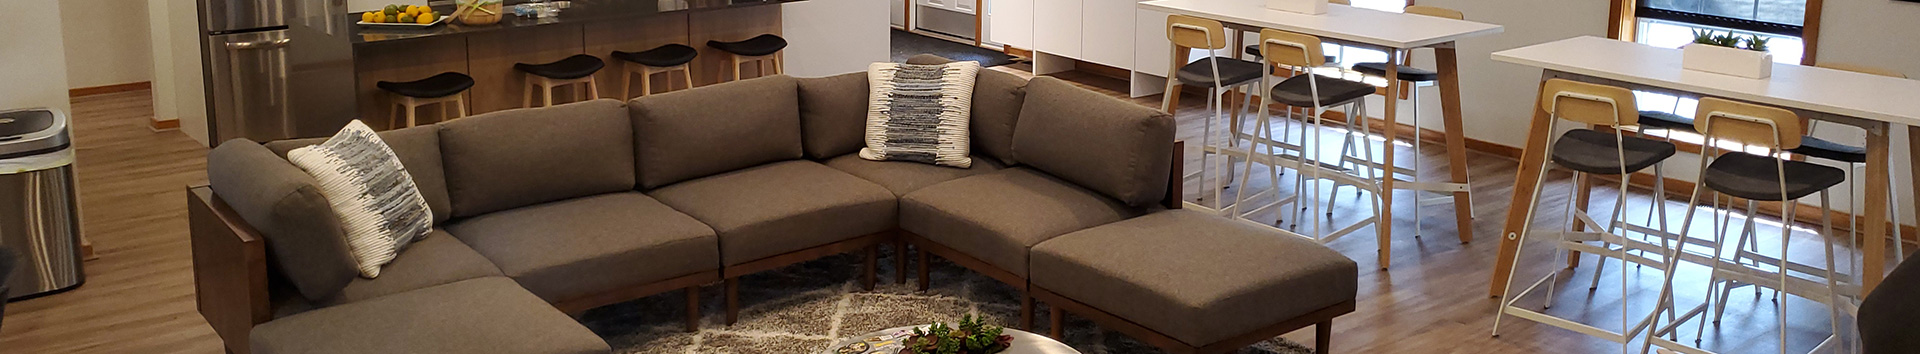 Furniture of Springetts Apartments at Manor Communities York Pennsylvania